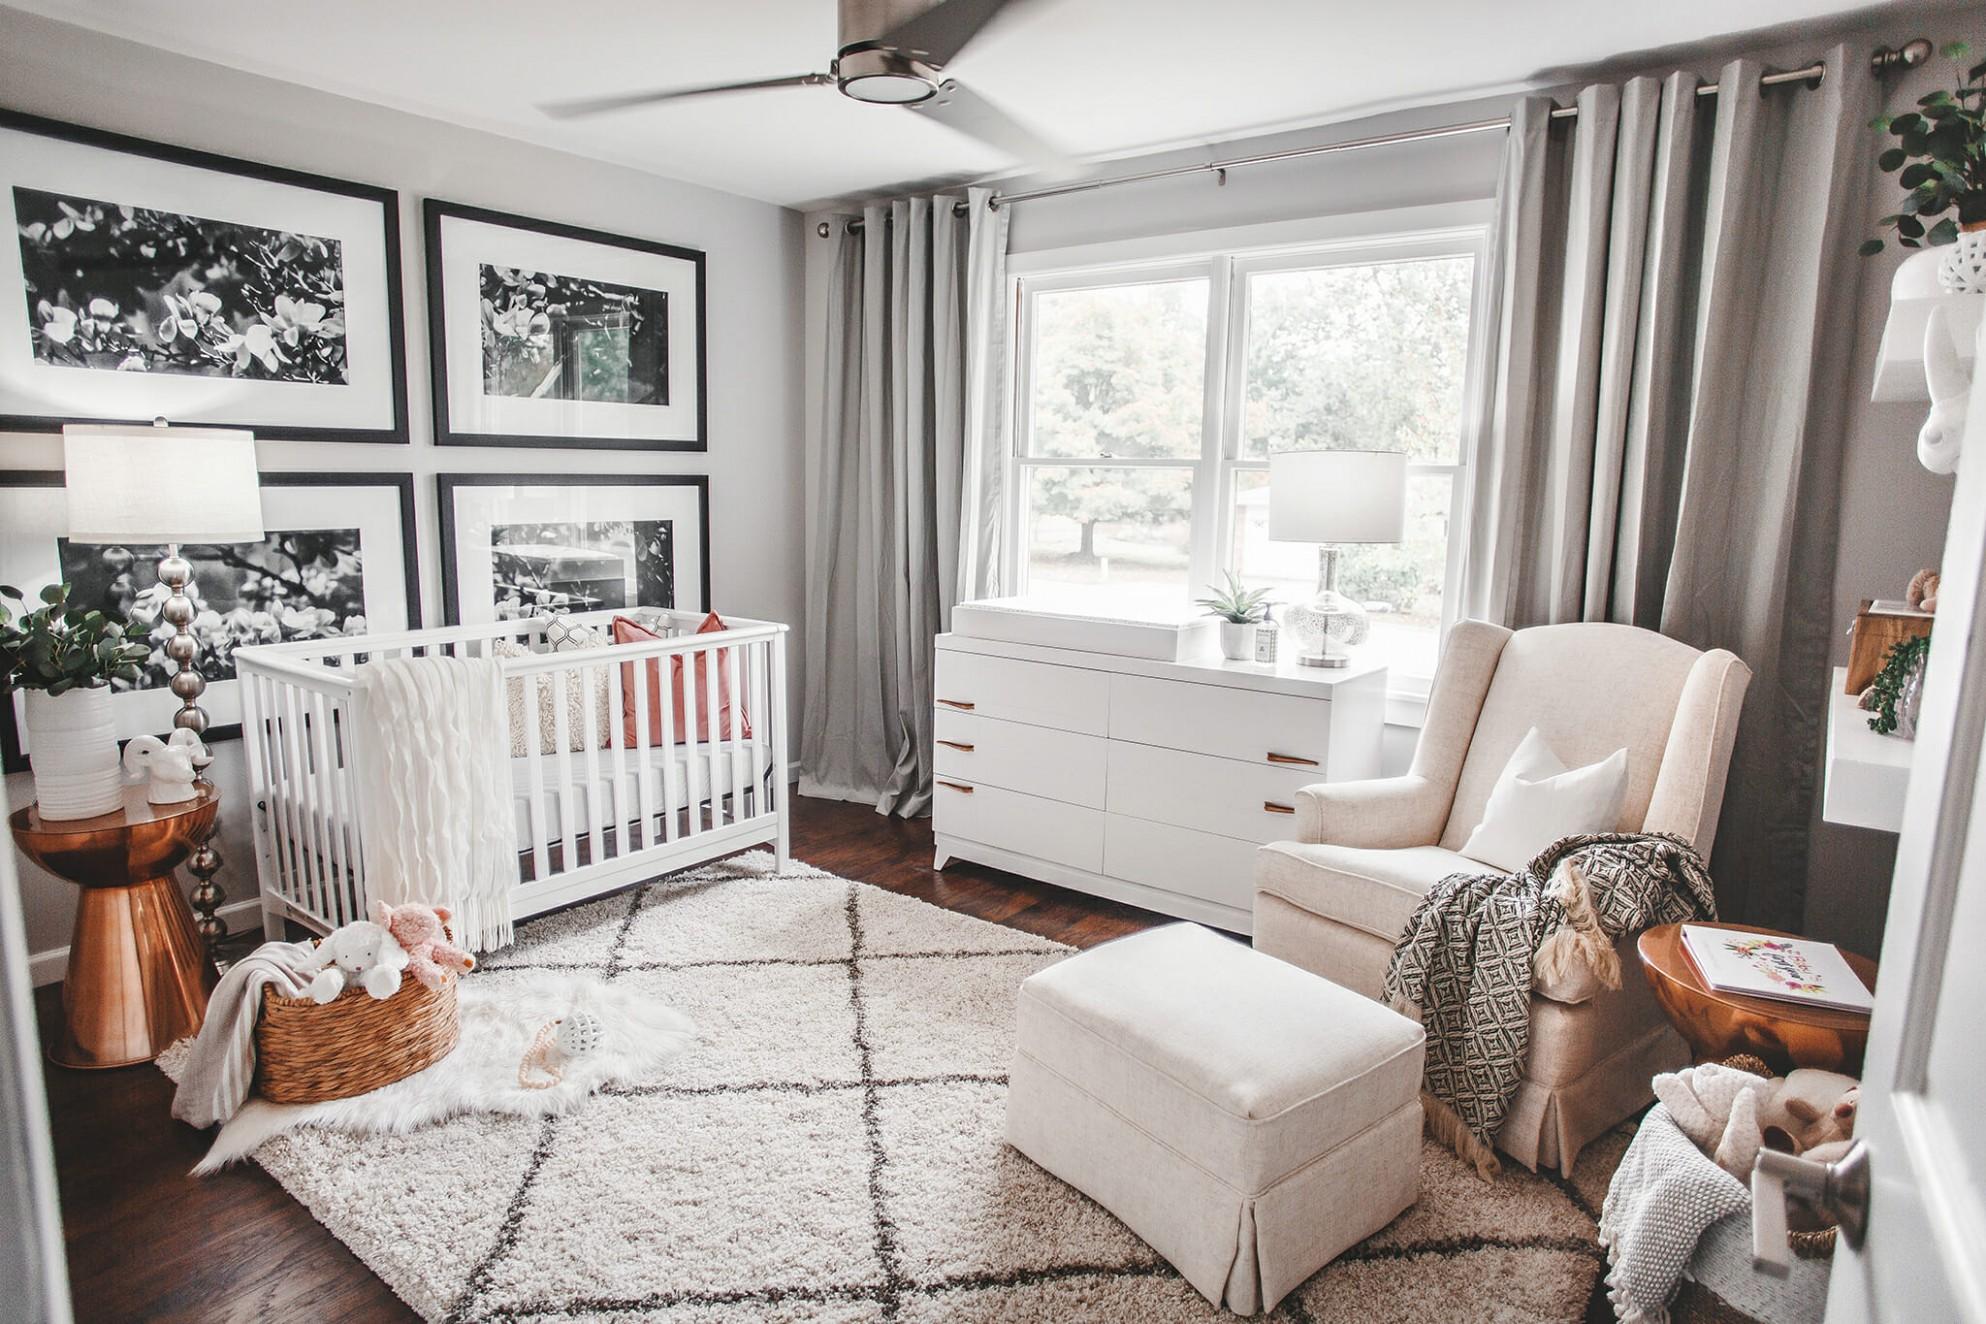 Before & After: Feminine & Lux Baby Nursery Design  Decorilla Online - Baby Room Interior